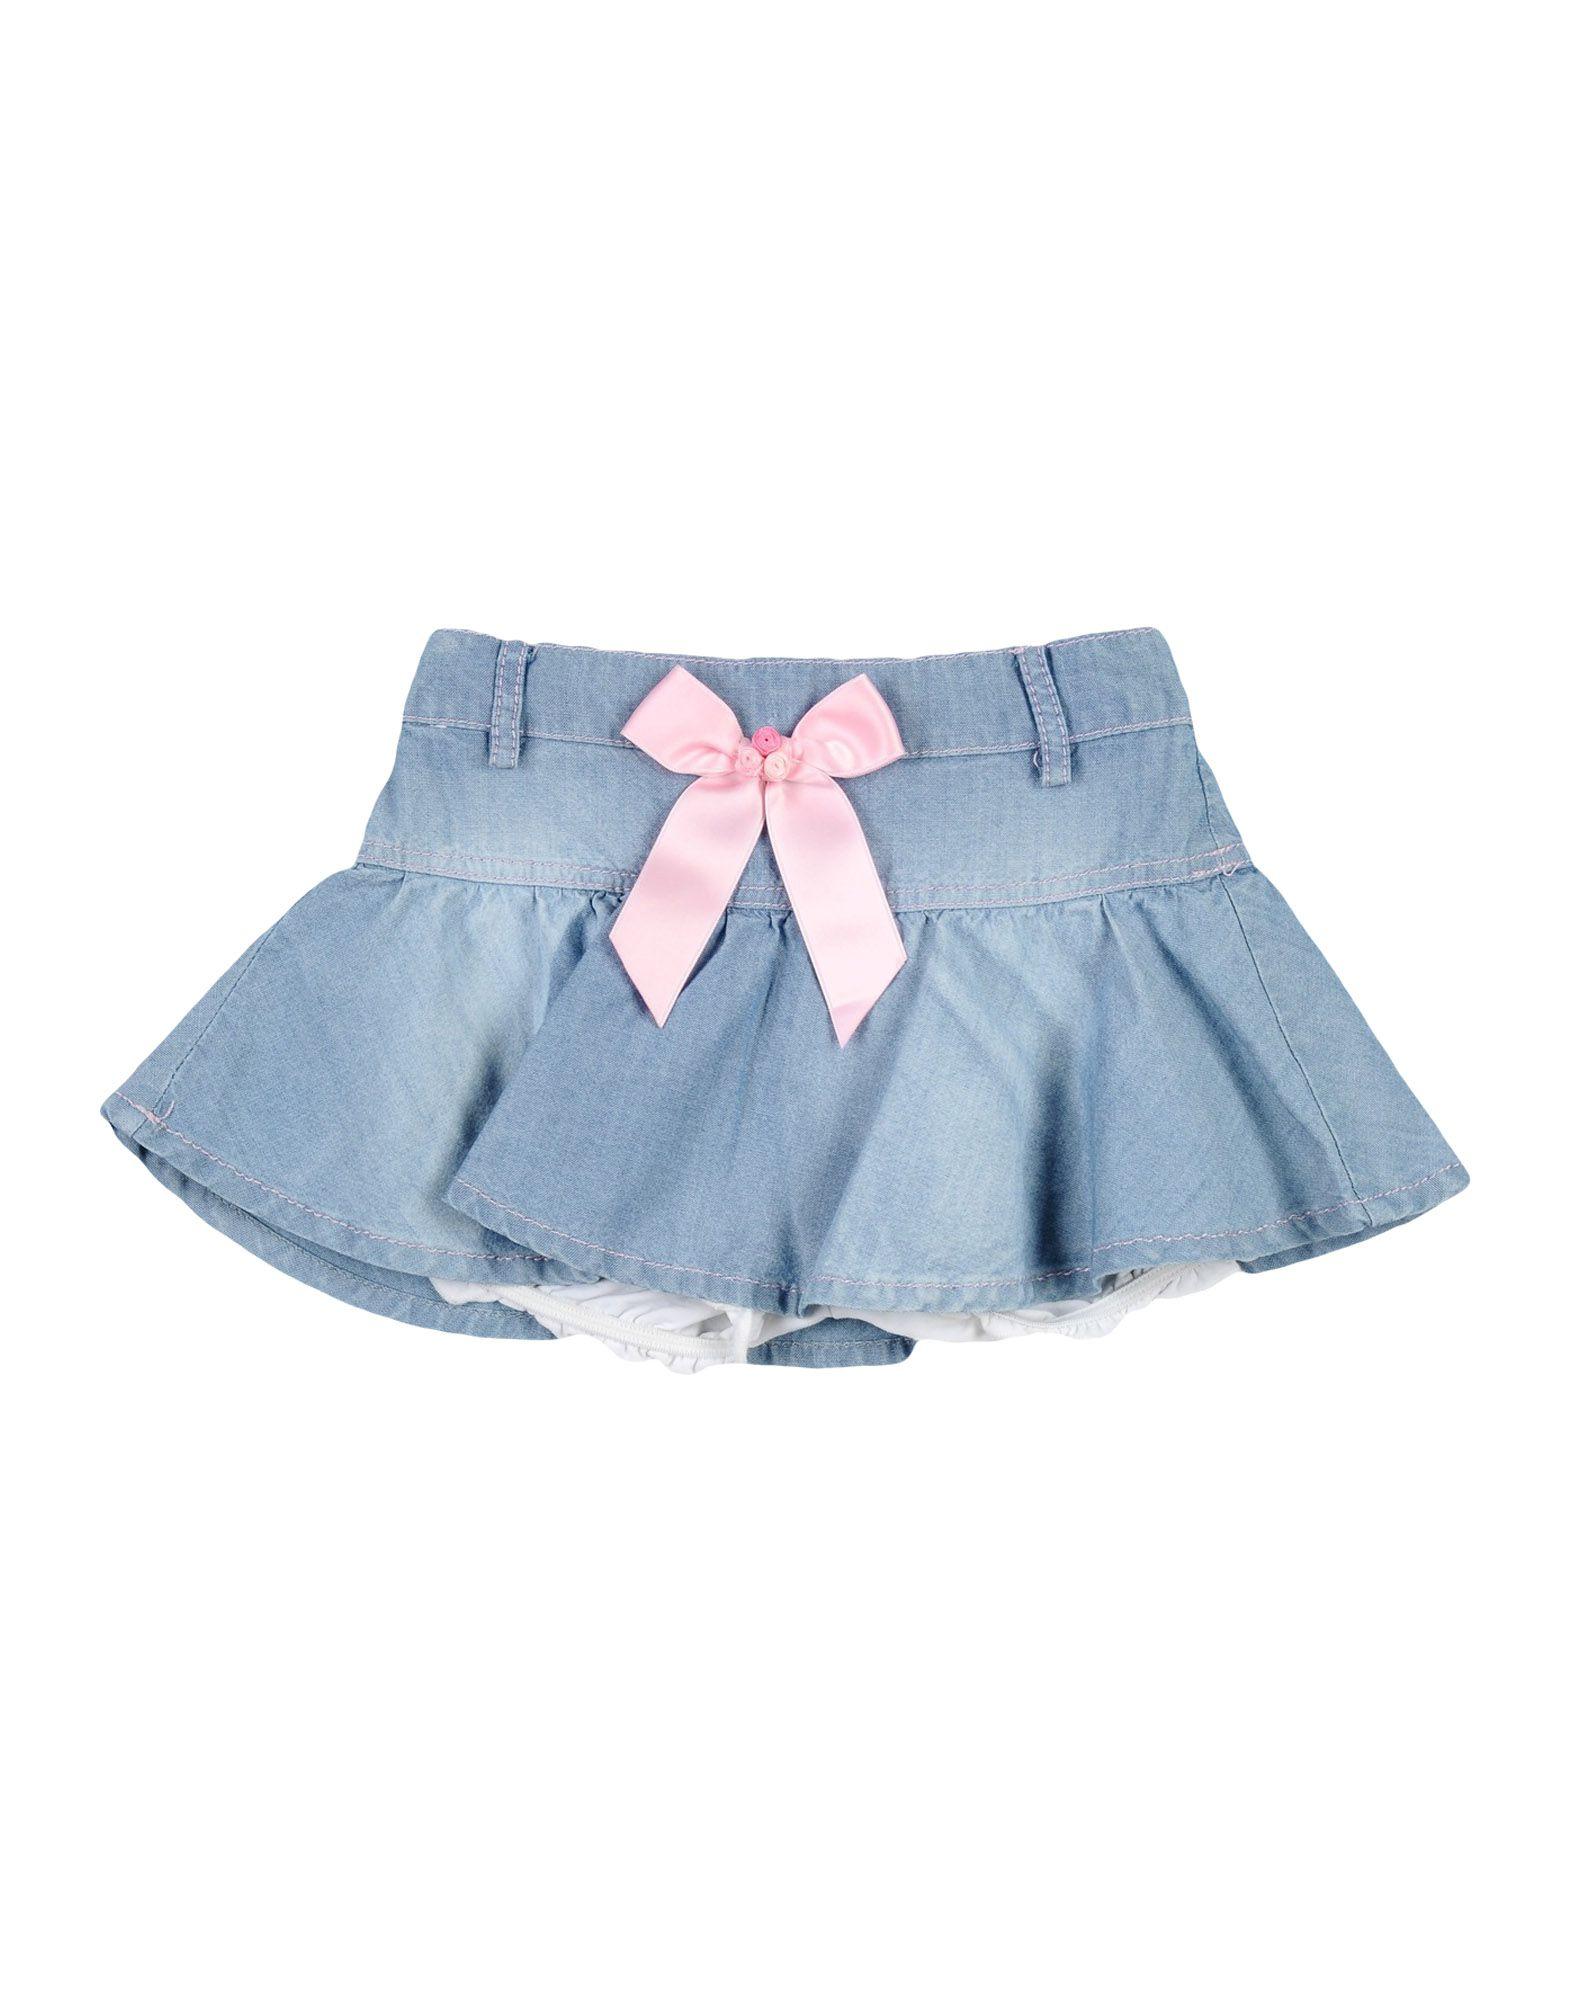 MISS BLUMARINE JEANS Джинсовая юбка miss blumarine baby 397995